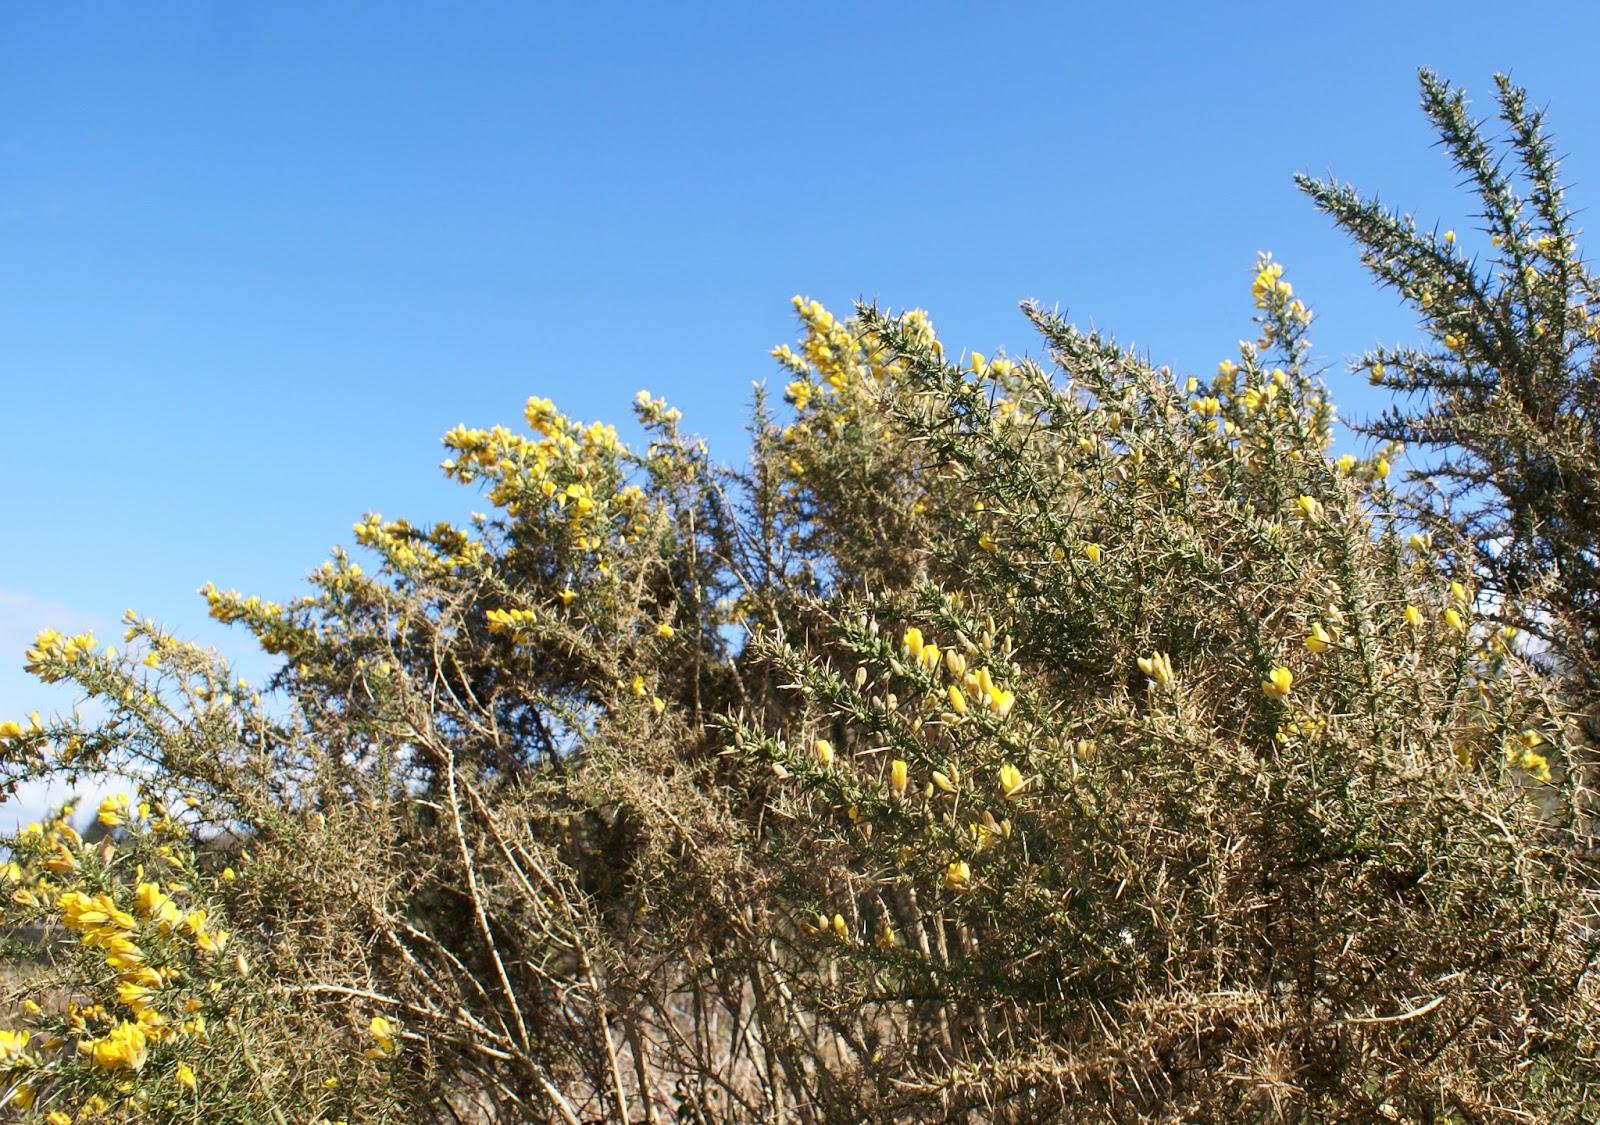 flowers loch linnhe highlands scotland united kingdom uk